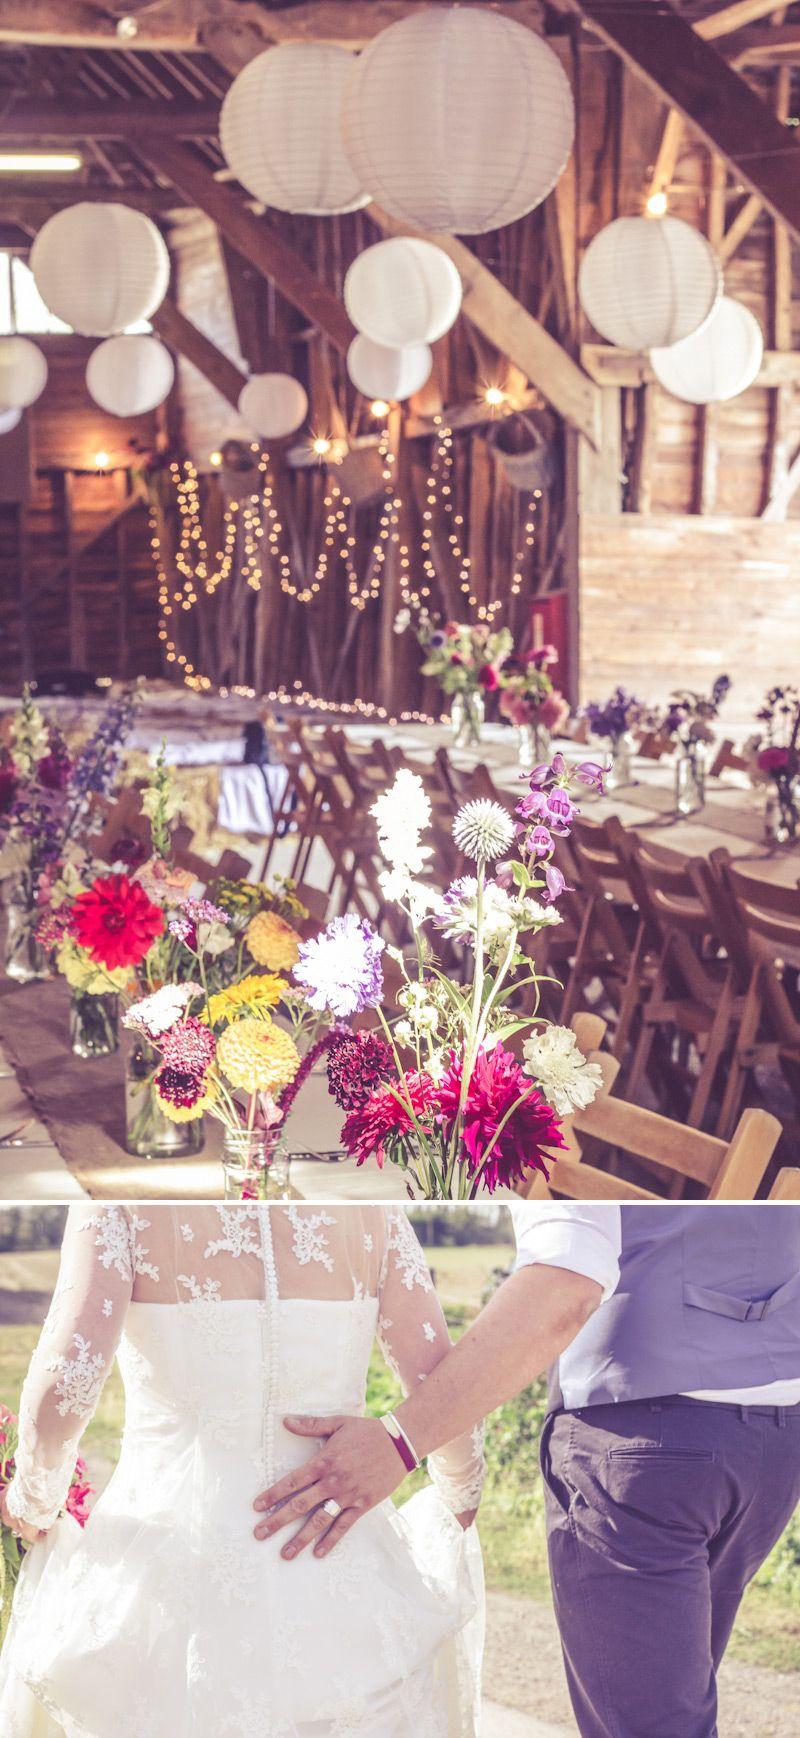 Diy elegant wedding decorations  A Rustic DIY Wedding With Wookie Photography  Rustic diy weddings